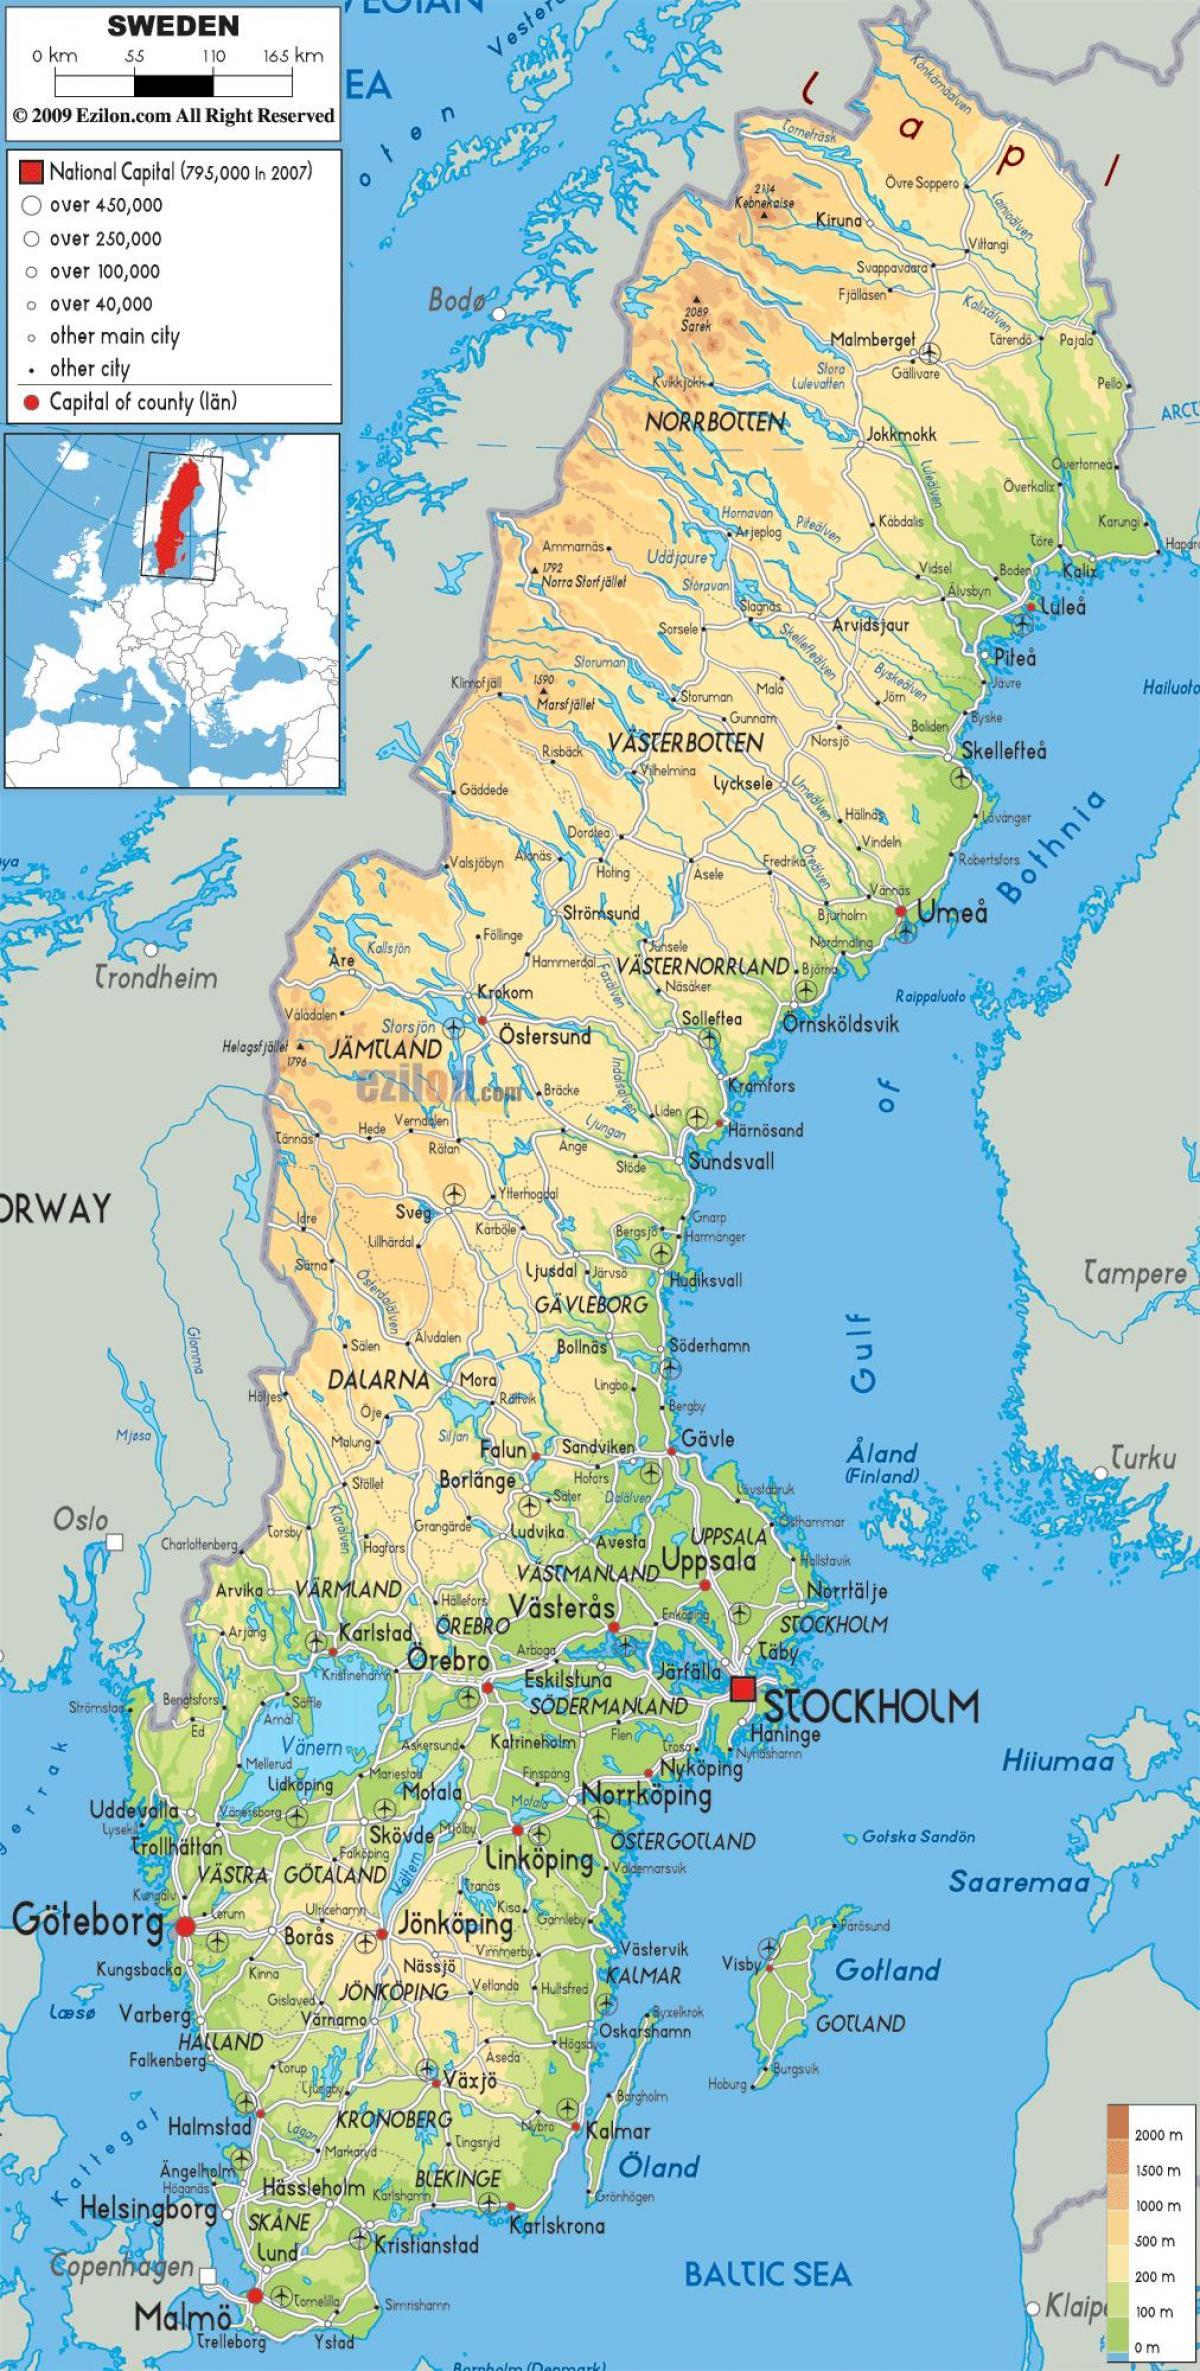 Suedia Geografie Harta Harta Geografică A Suediei Europa De